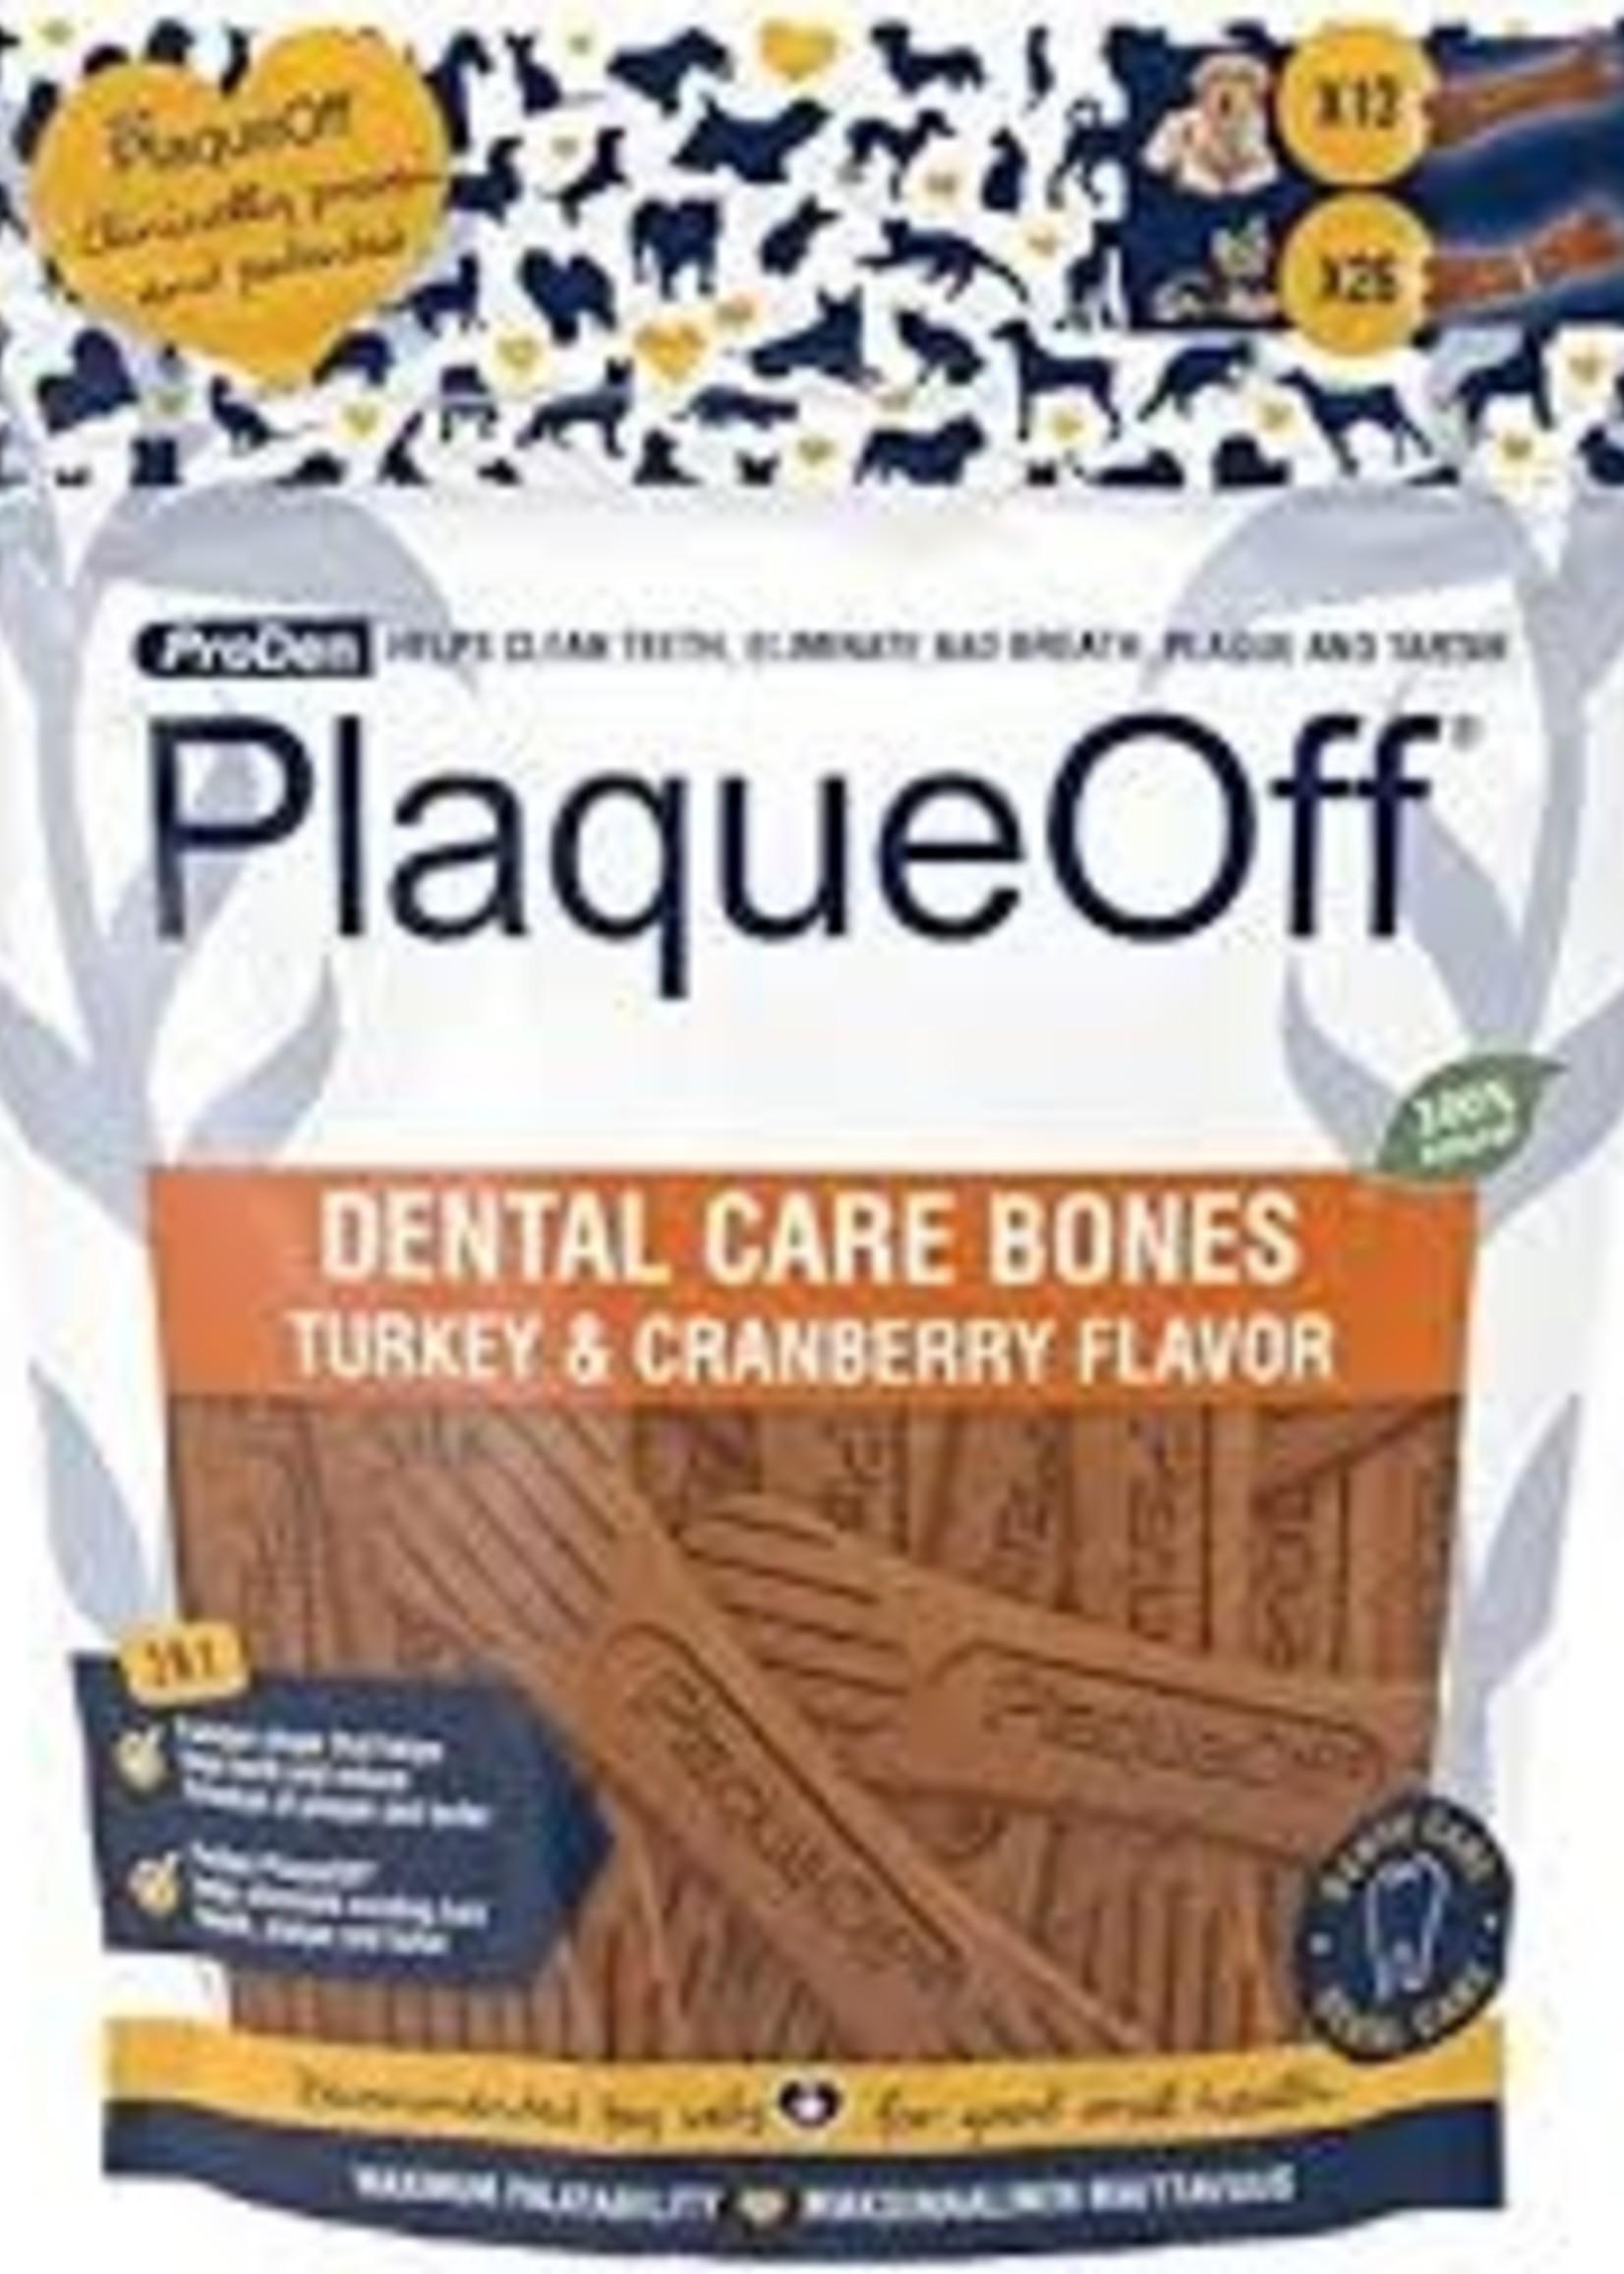 Plaque Off Dental Care Bones Turkey & Cranberry